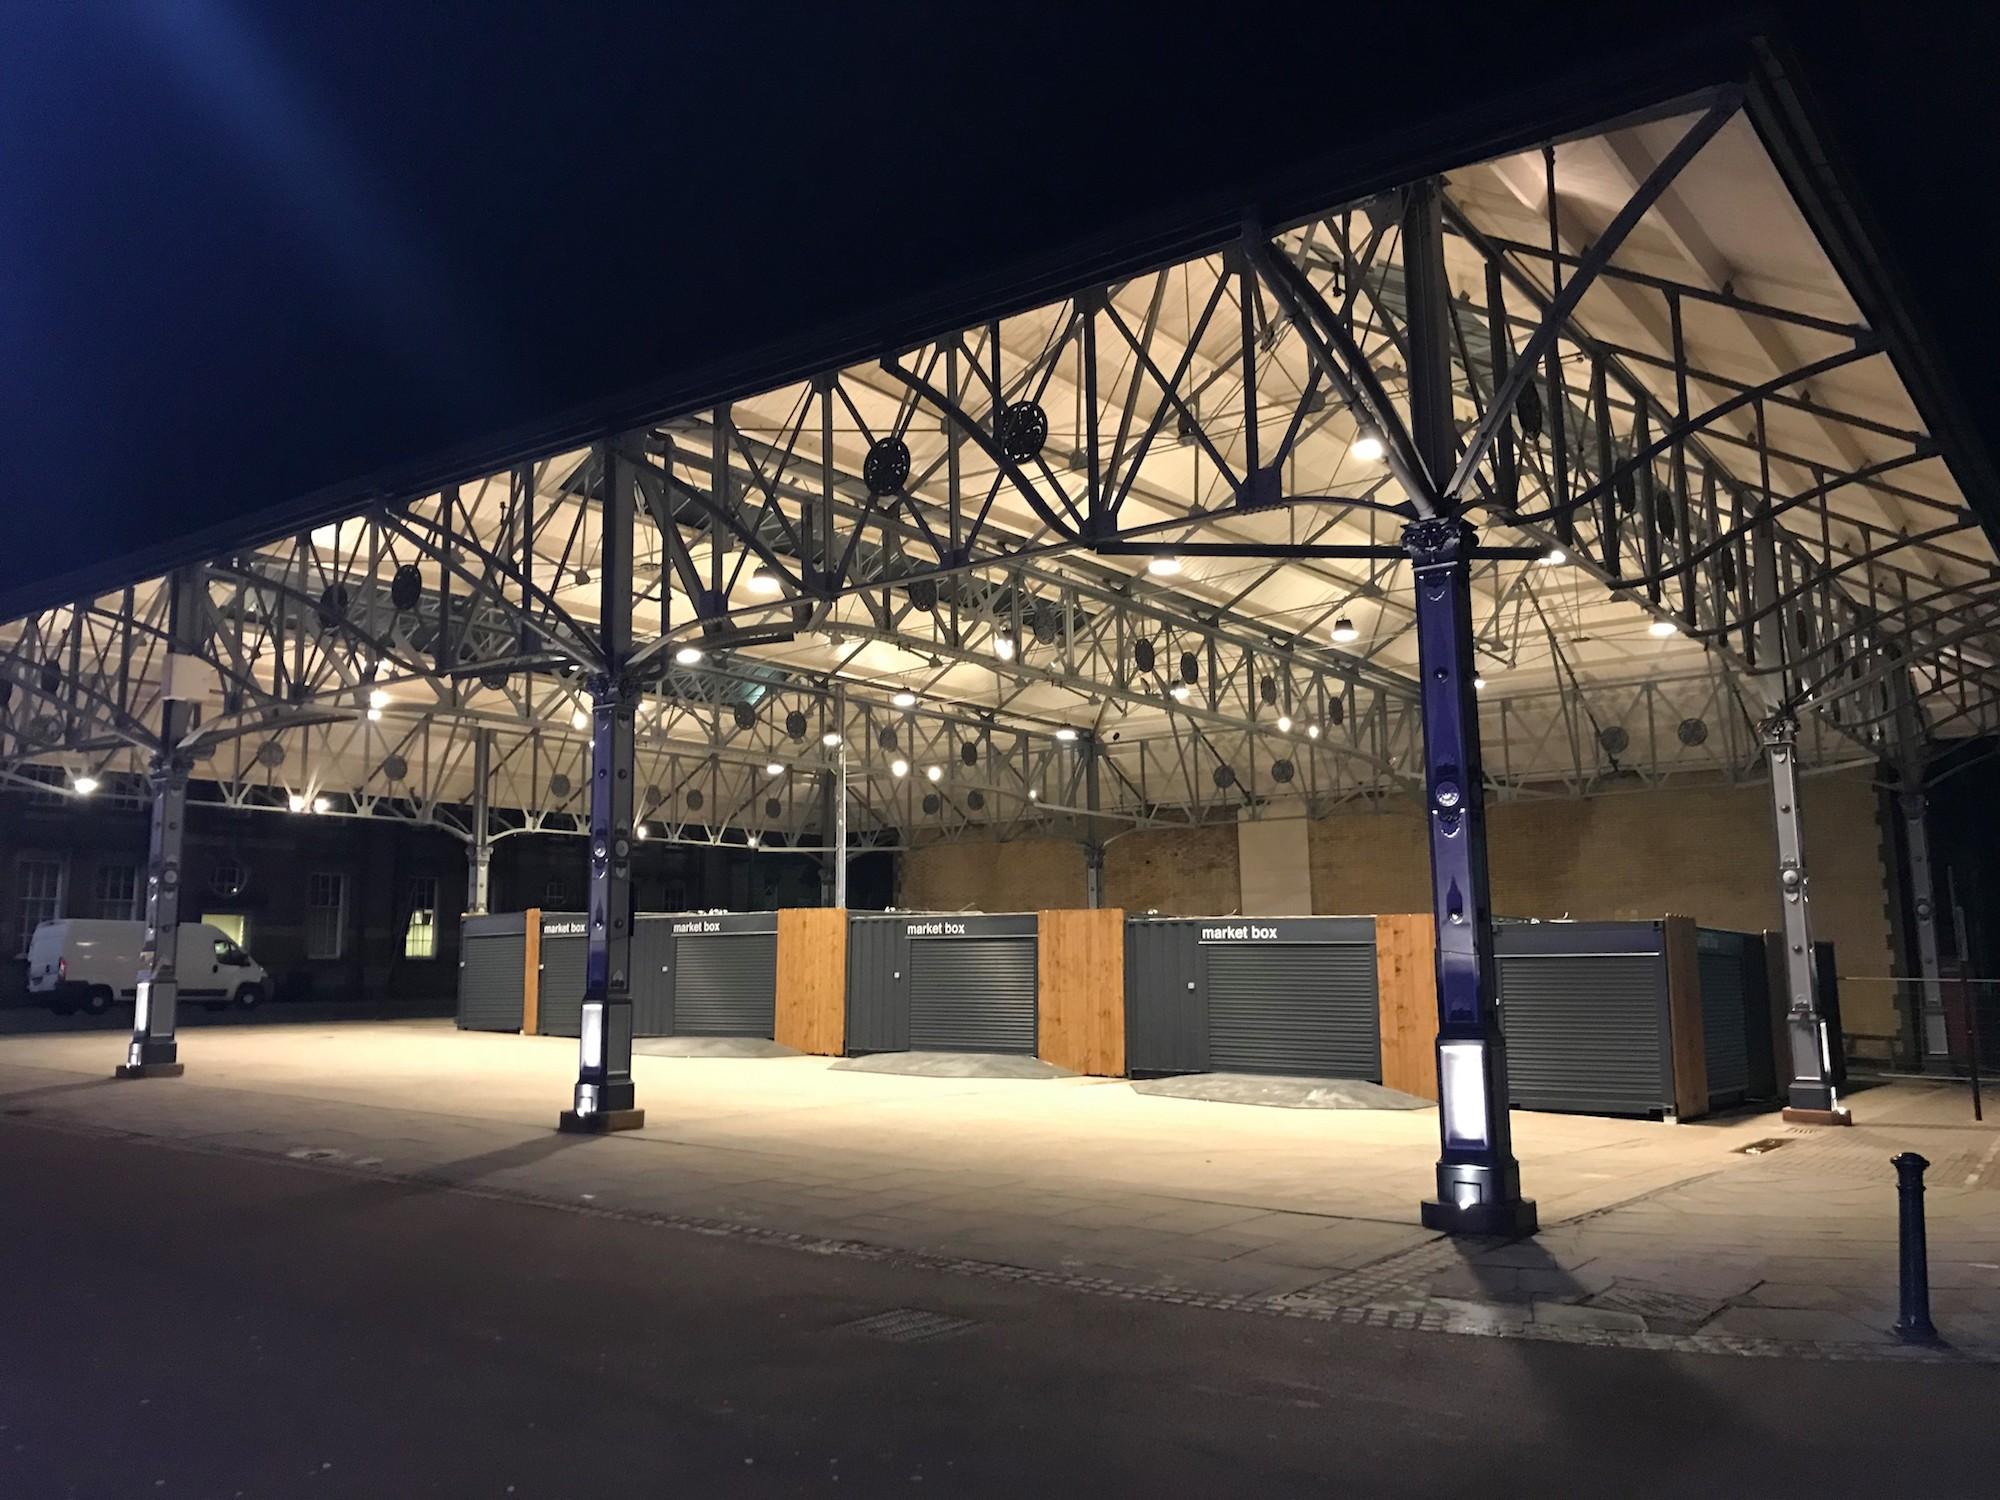 Box Market Preston